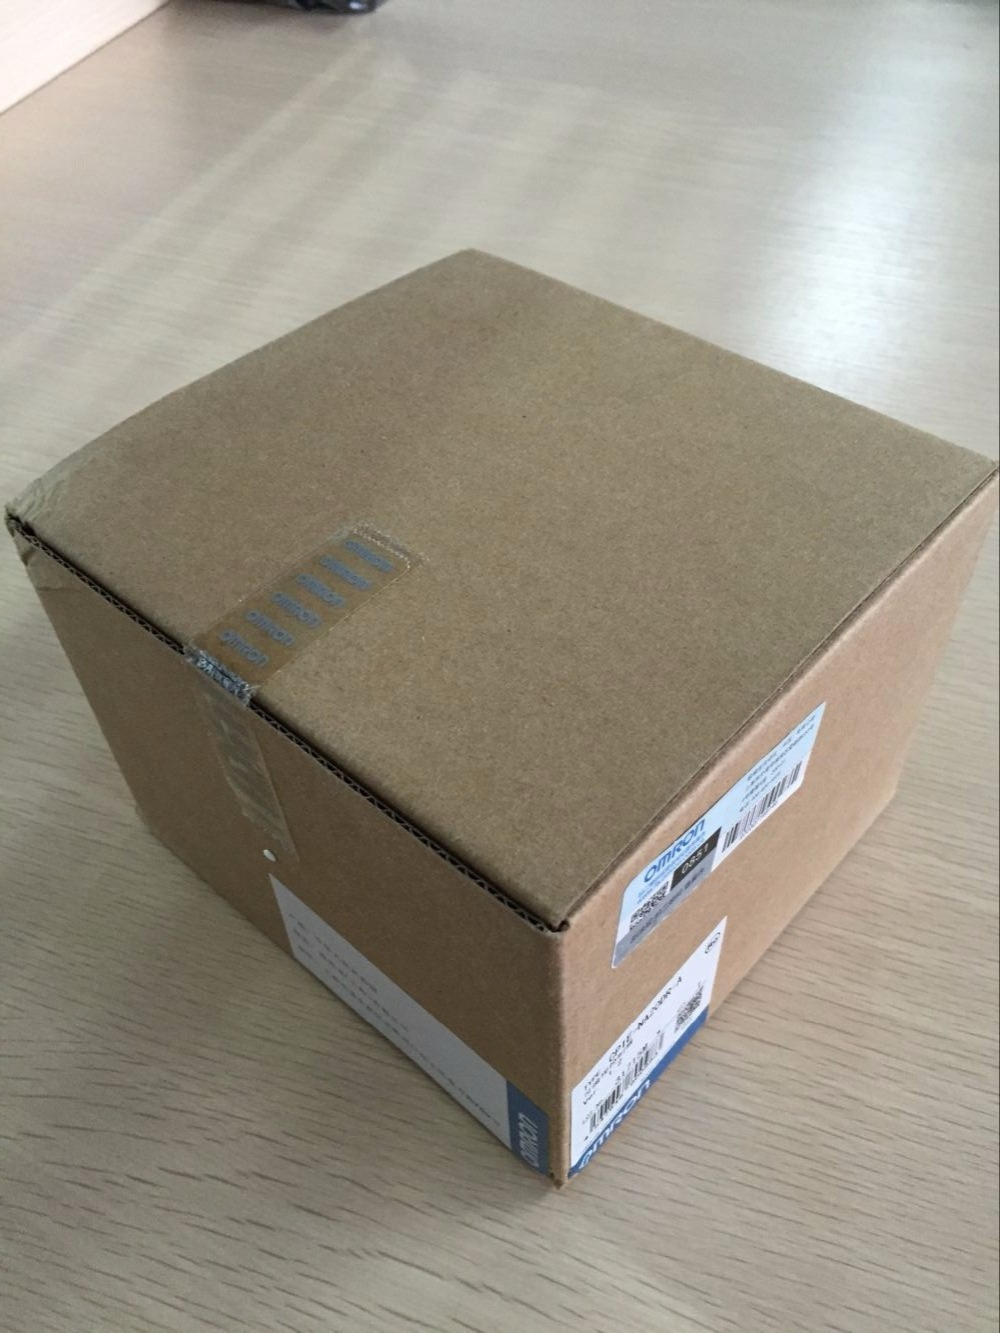 New Original DVP16HM11N EH2/EH3 Series PLC Digital Module DI 16 well tested working three months warranty<br><br>Aliexpress